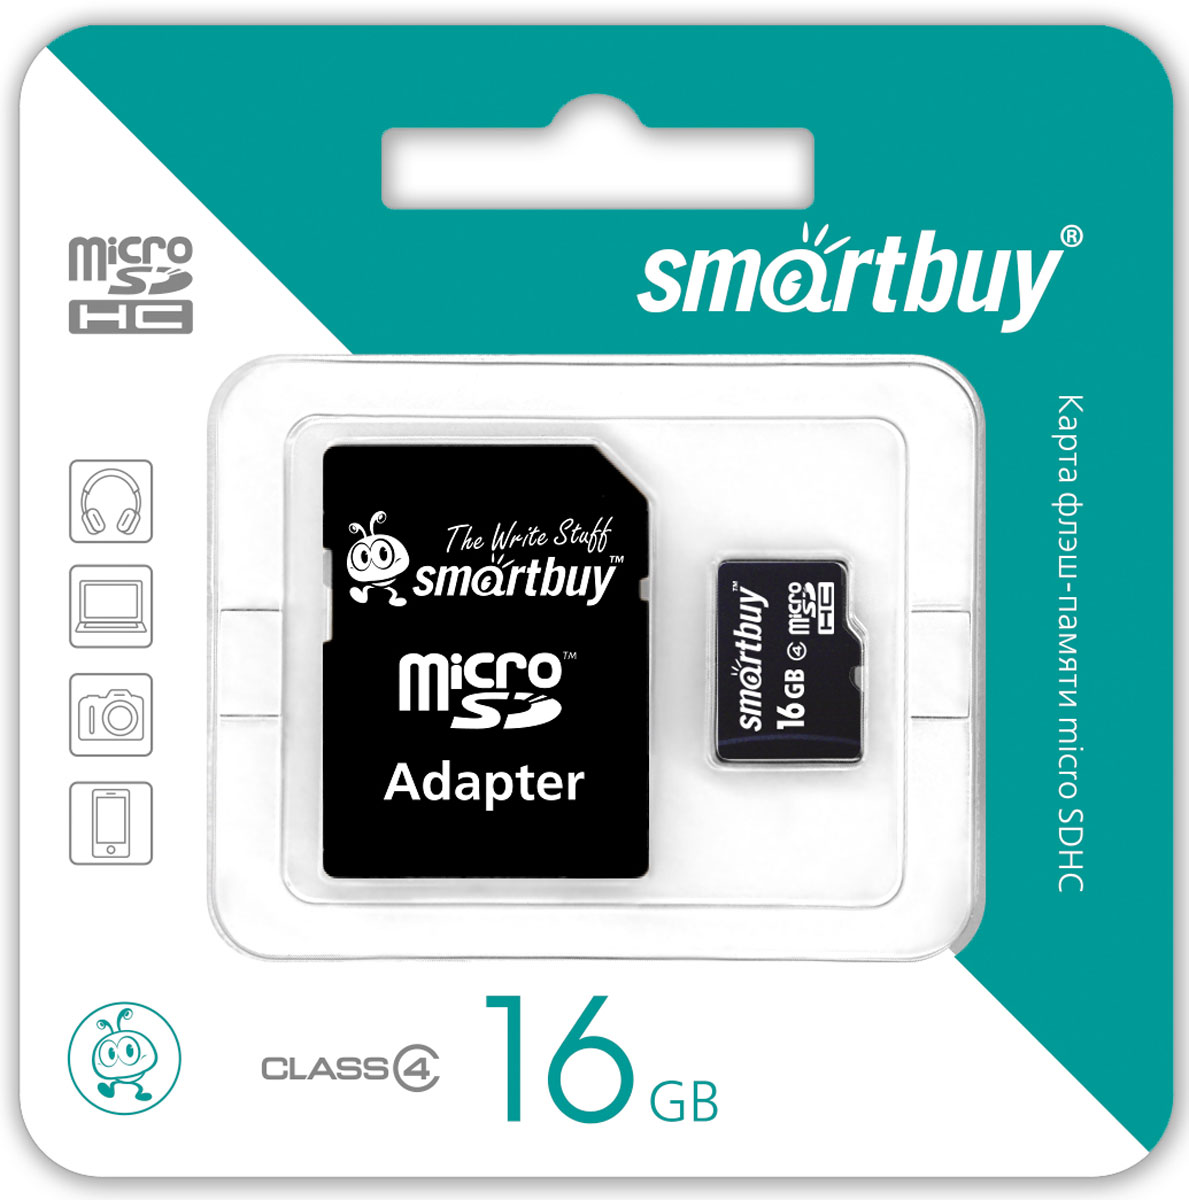 SmartBuy microSDHC Class 4 16GB карта памяти (с адаптером SD) карта памяти smartbuy microsdhc 16gb class 10 адаптер черный